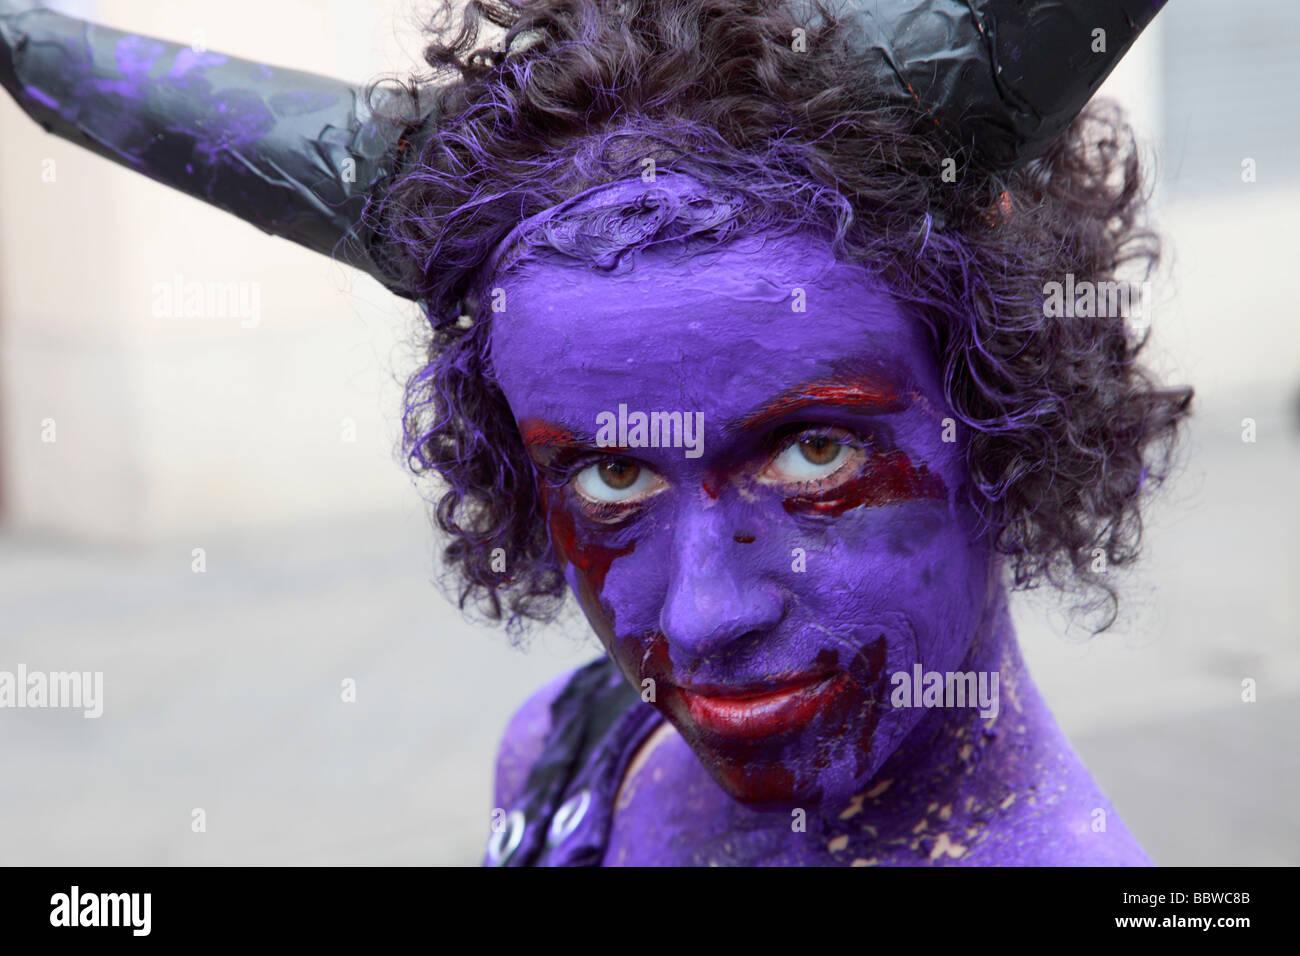 Allemagne Berlin Carnaval des Cultures femme avec visage peint Photo Stock